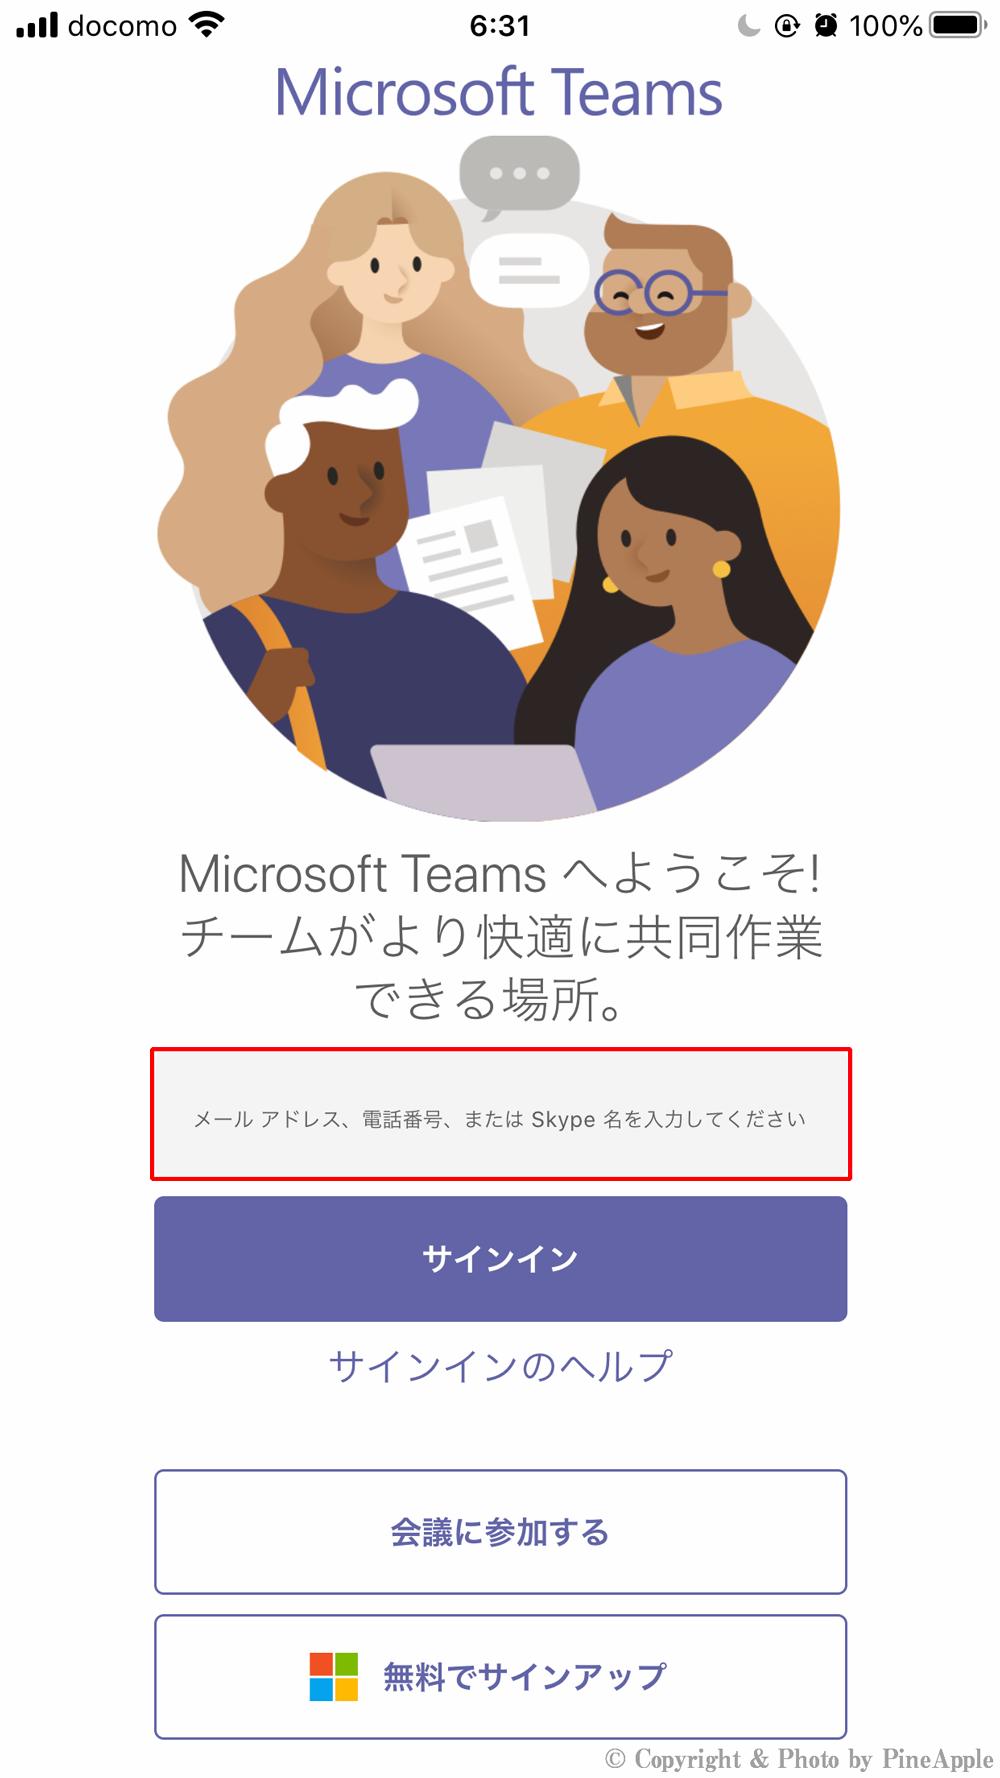 Microsoft Teams:「メール アドレス、電話番号、または Skype 名を入力してください」の項目にアカウント名を入力